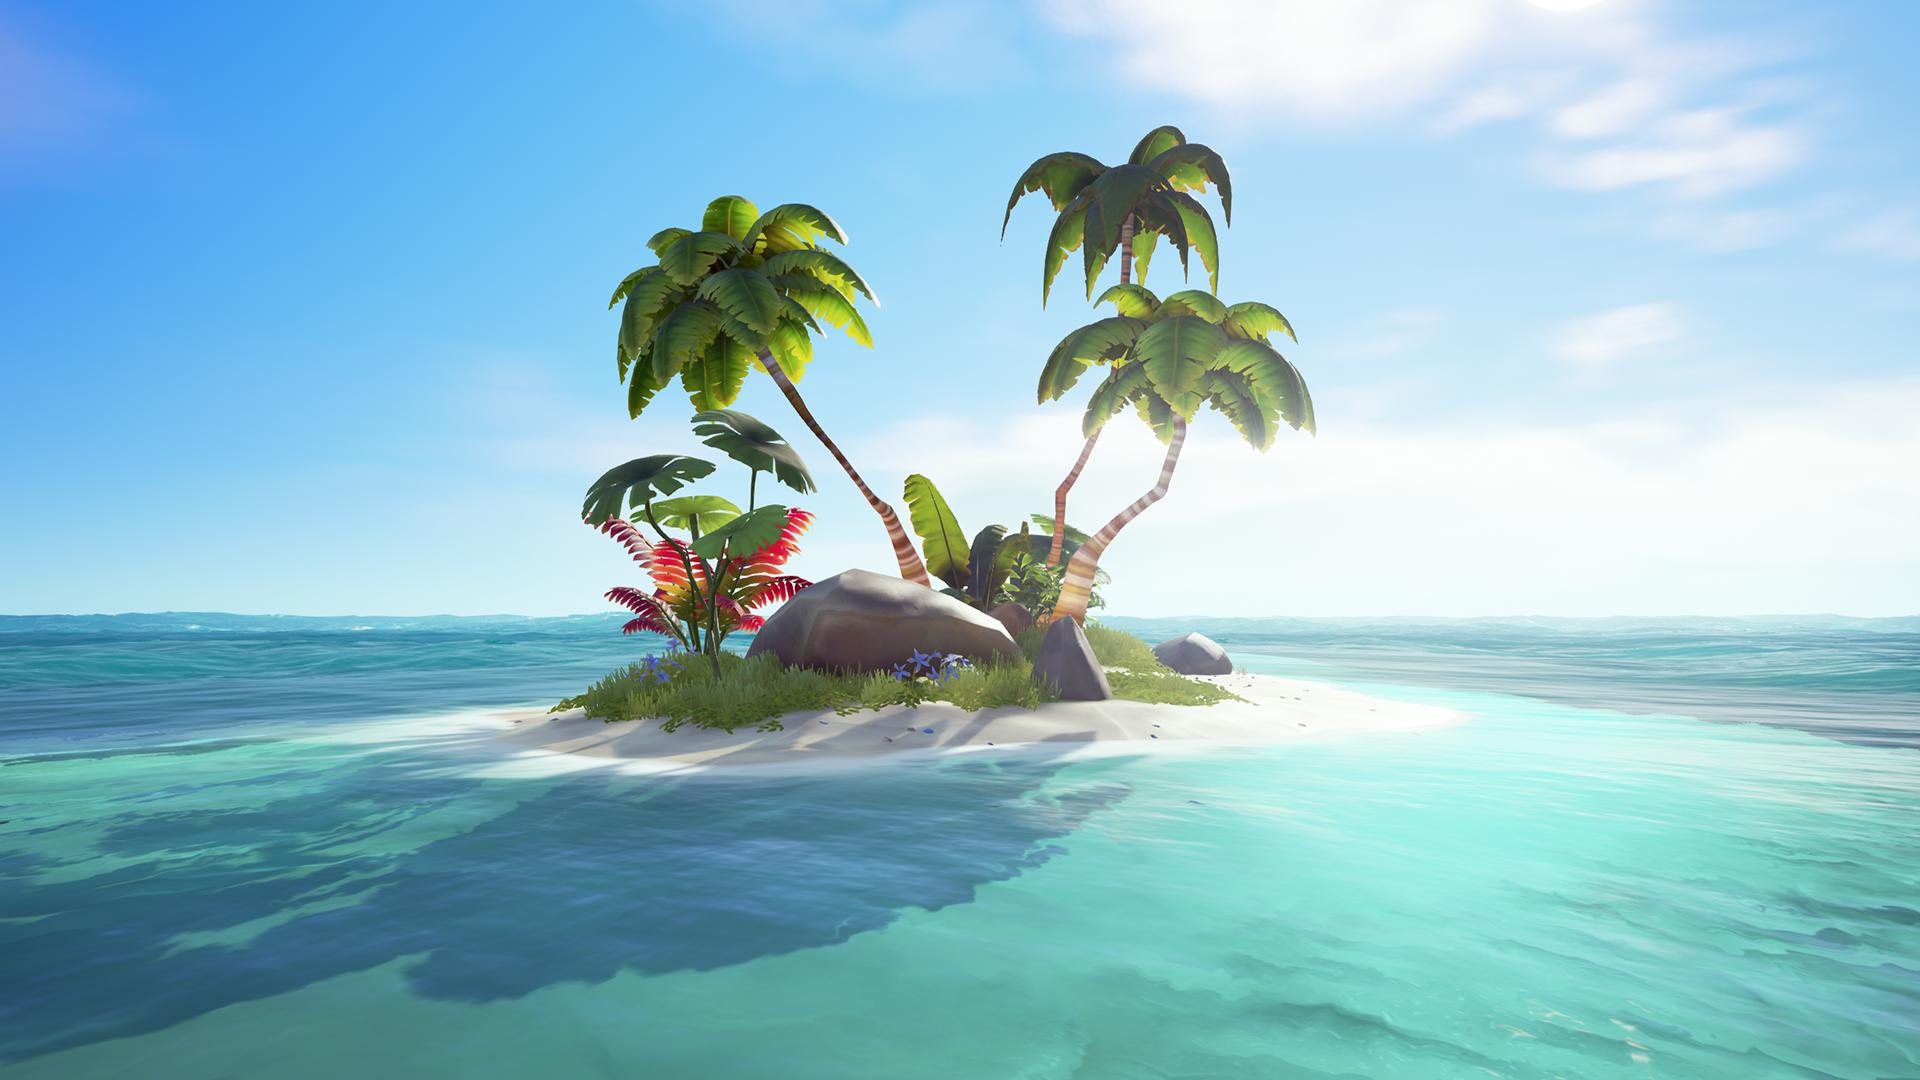 tech_alpha_island_scr00pxv.png